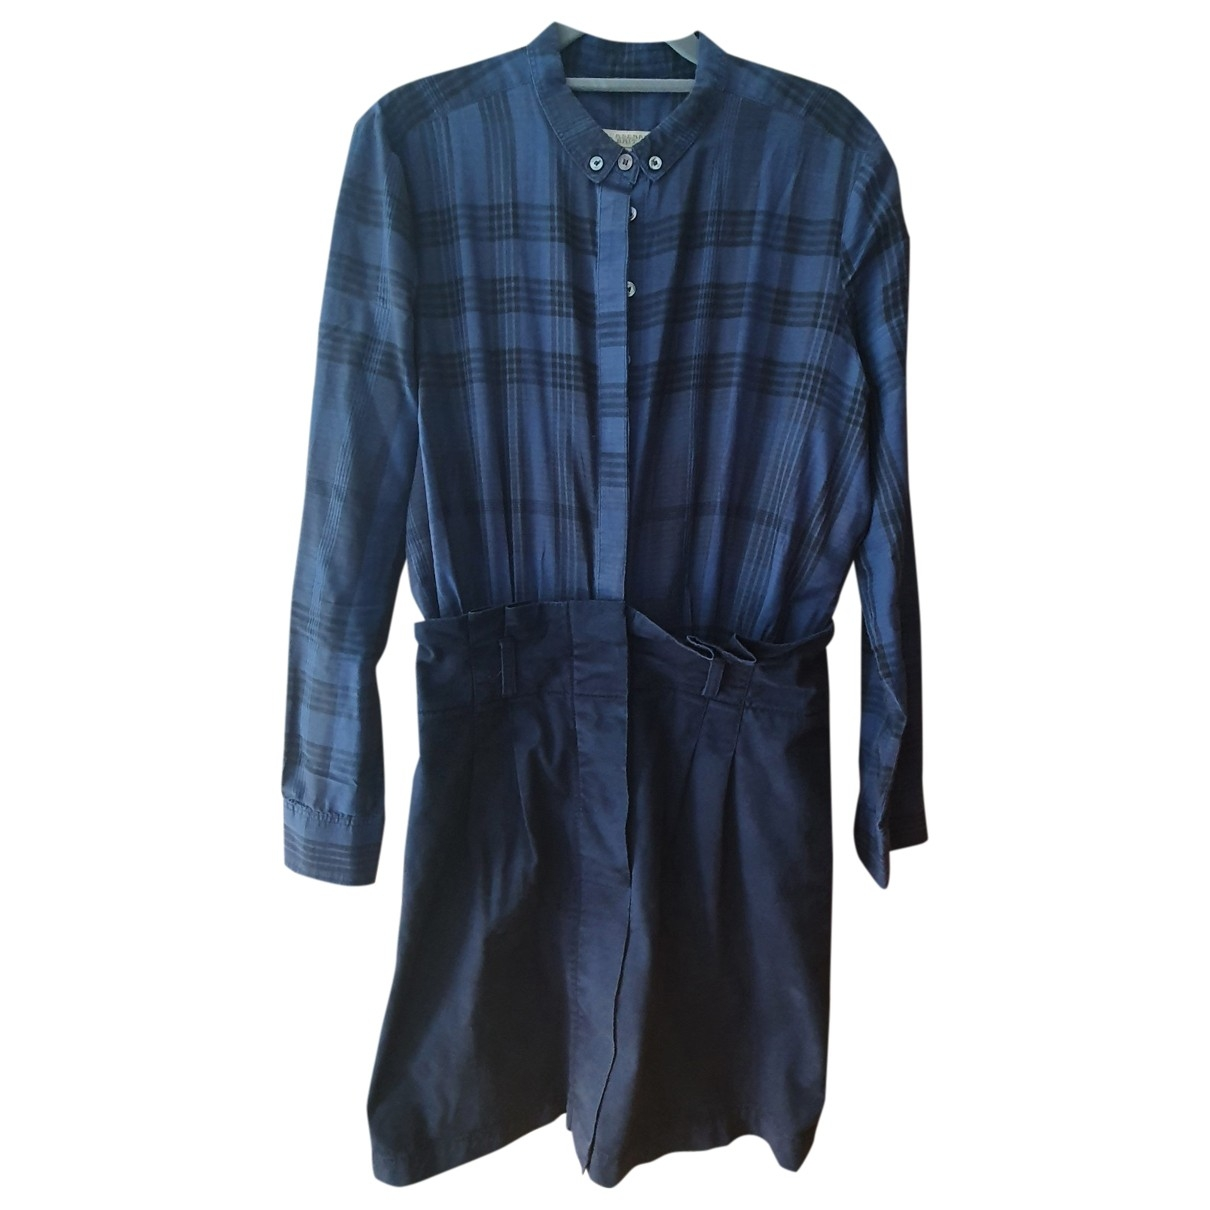 Burberry \N Navy Cotton dress for Women 40 FR